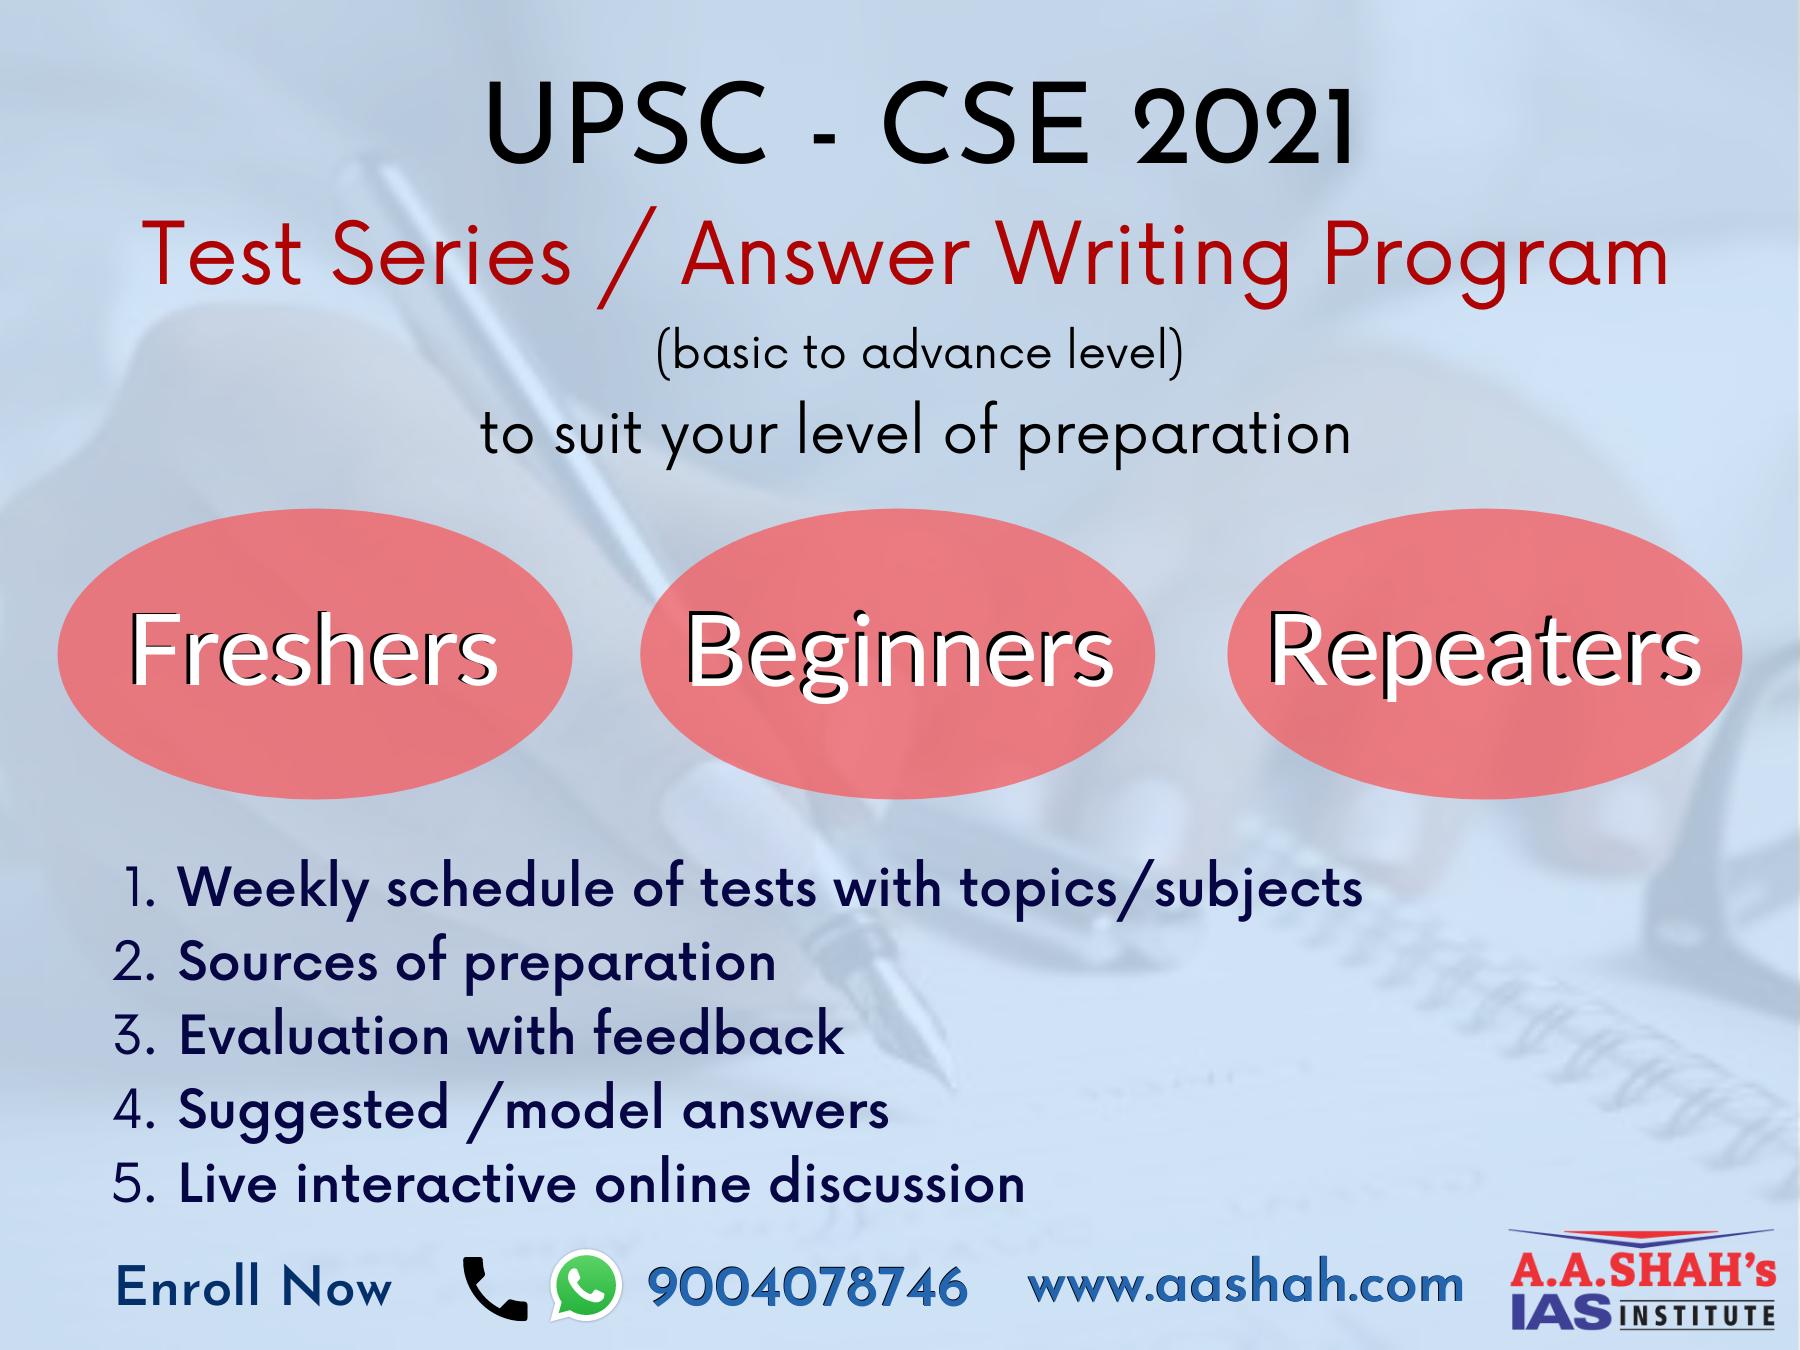 upsc test series